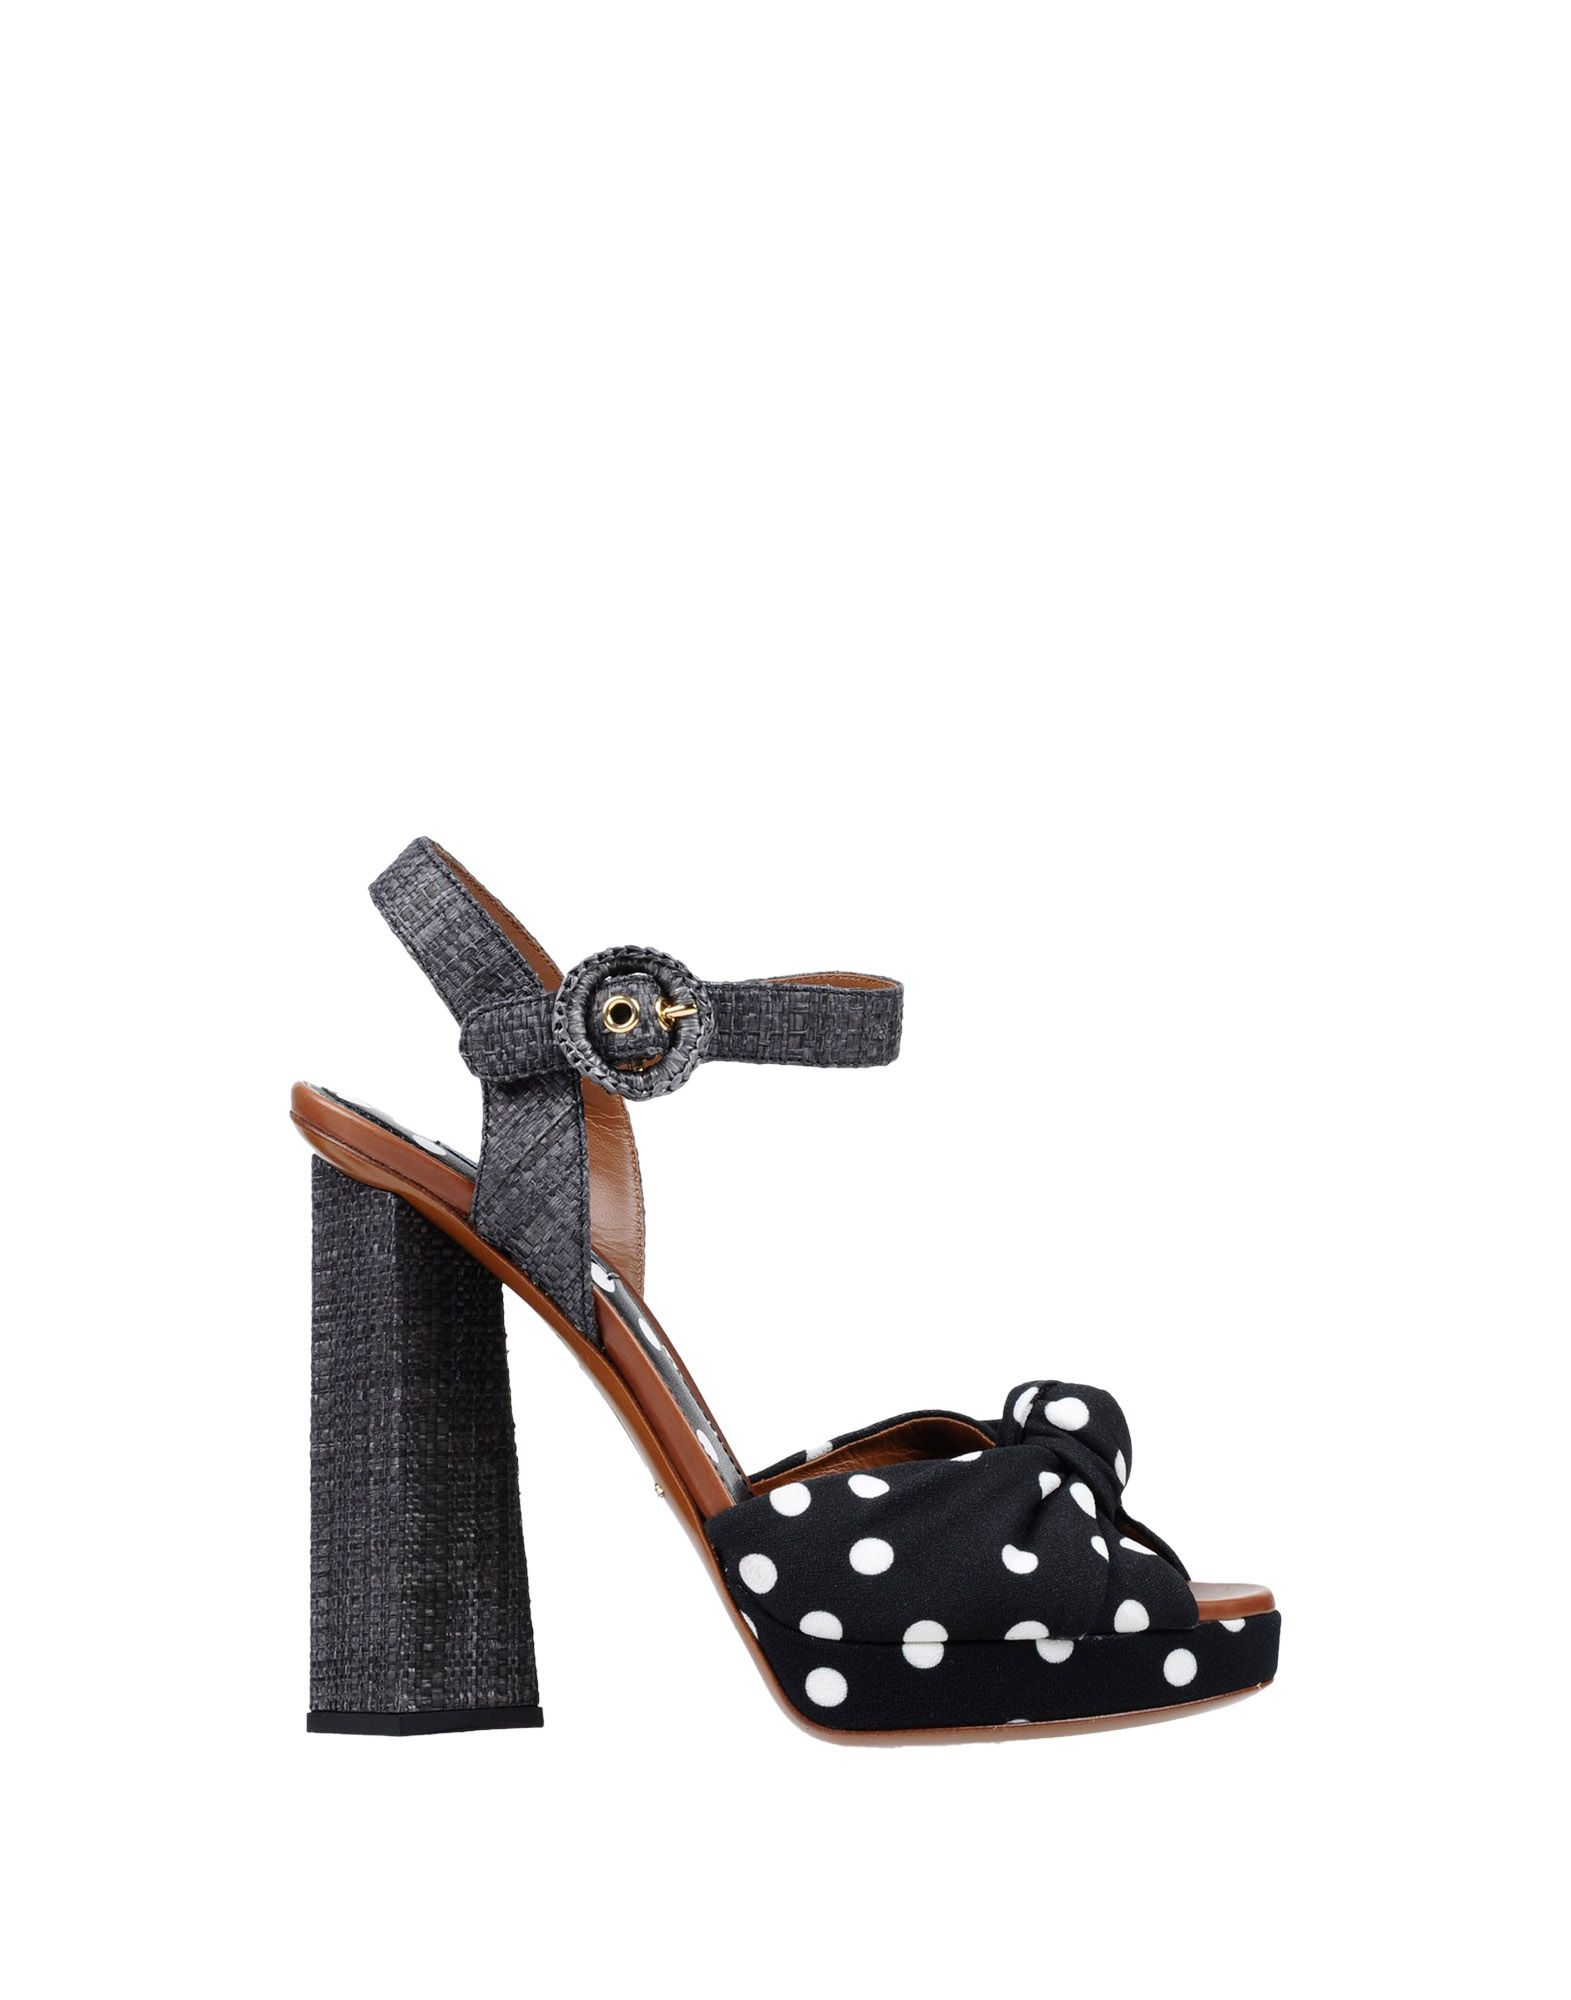 Dolce & Gabbana Sandalen  Damen  Sandalen 11362712NU Neue Schuhe 6c4698